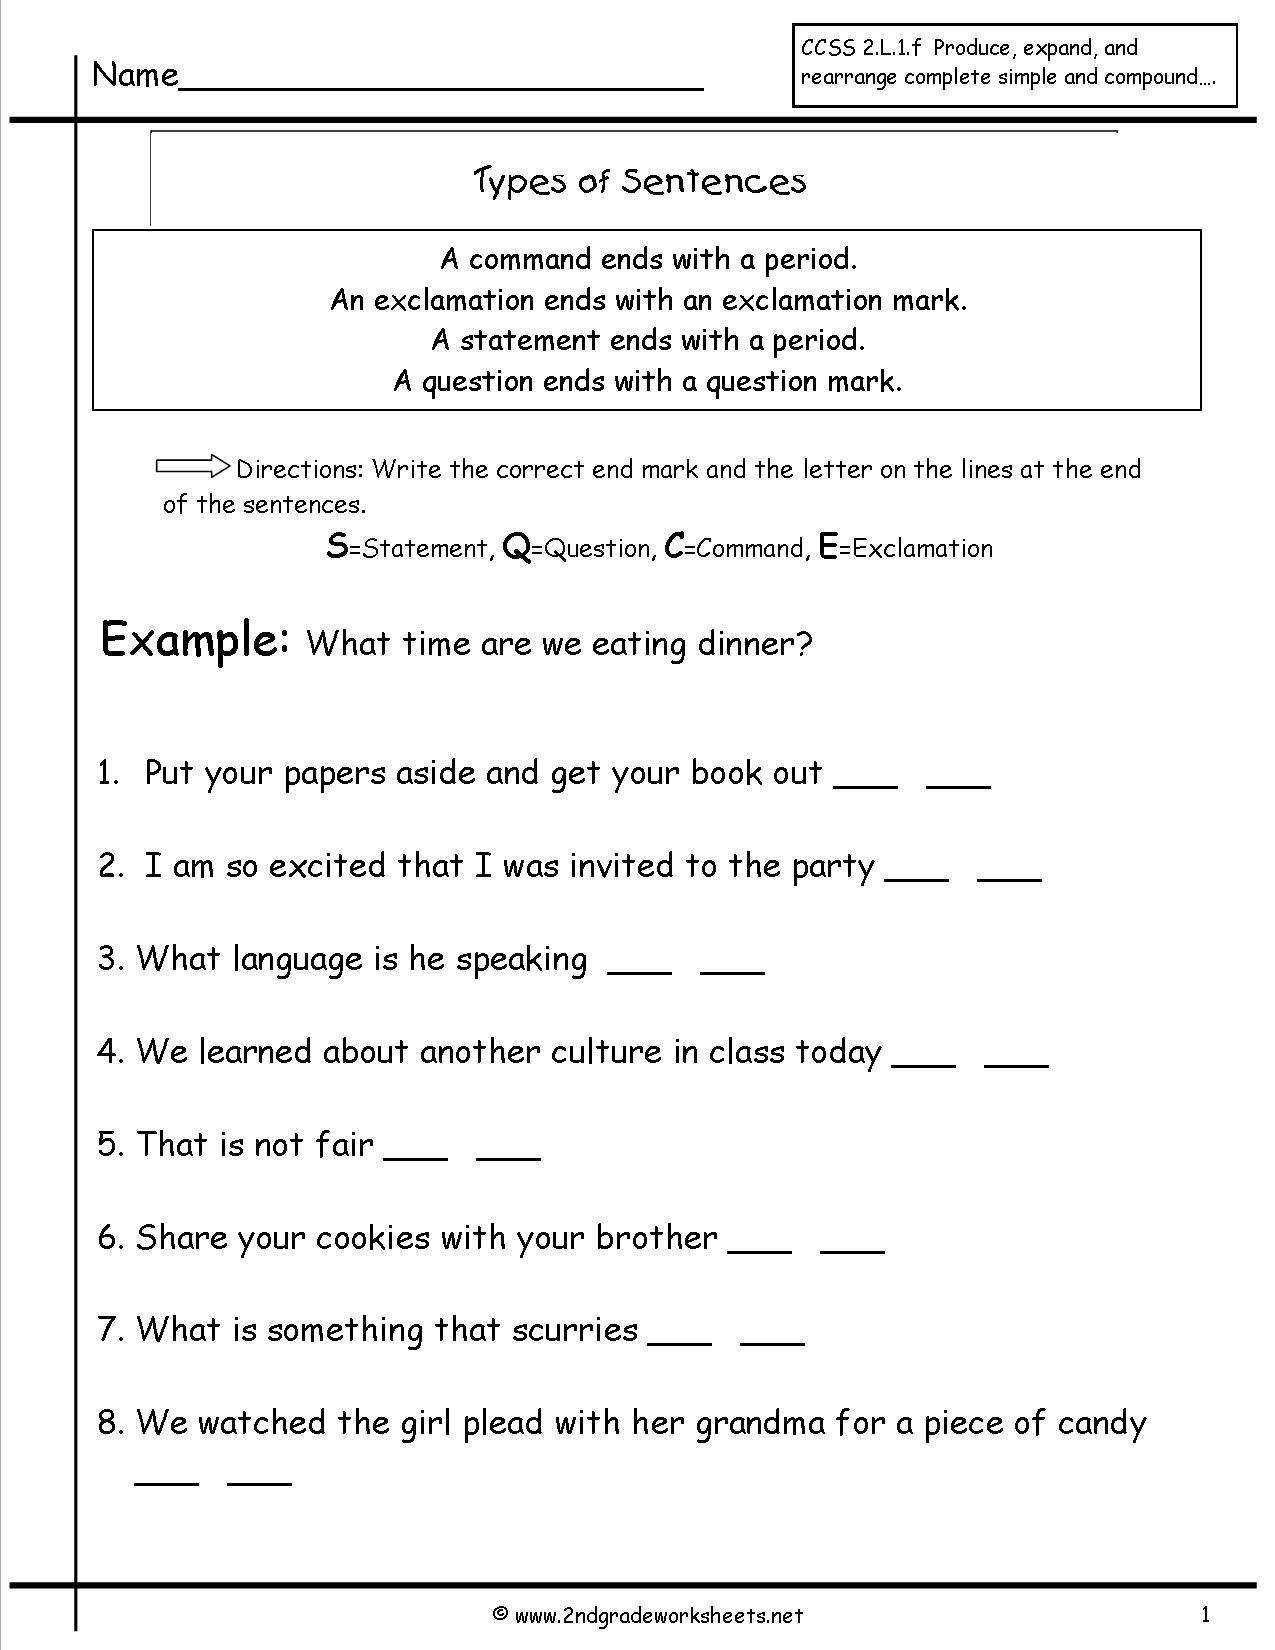 Simple Sentences Worksheet 3rd Grade Second Grade Sentences Worksheets Ccss 2 L 1 F Worksheets